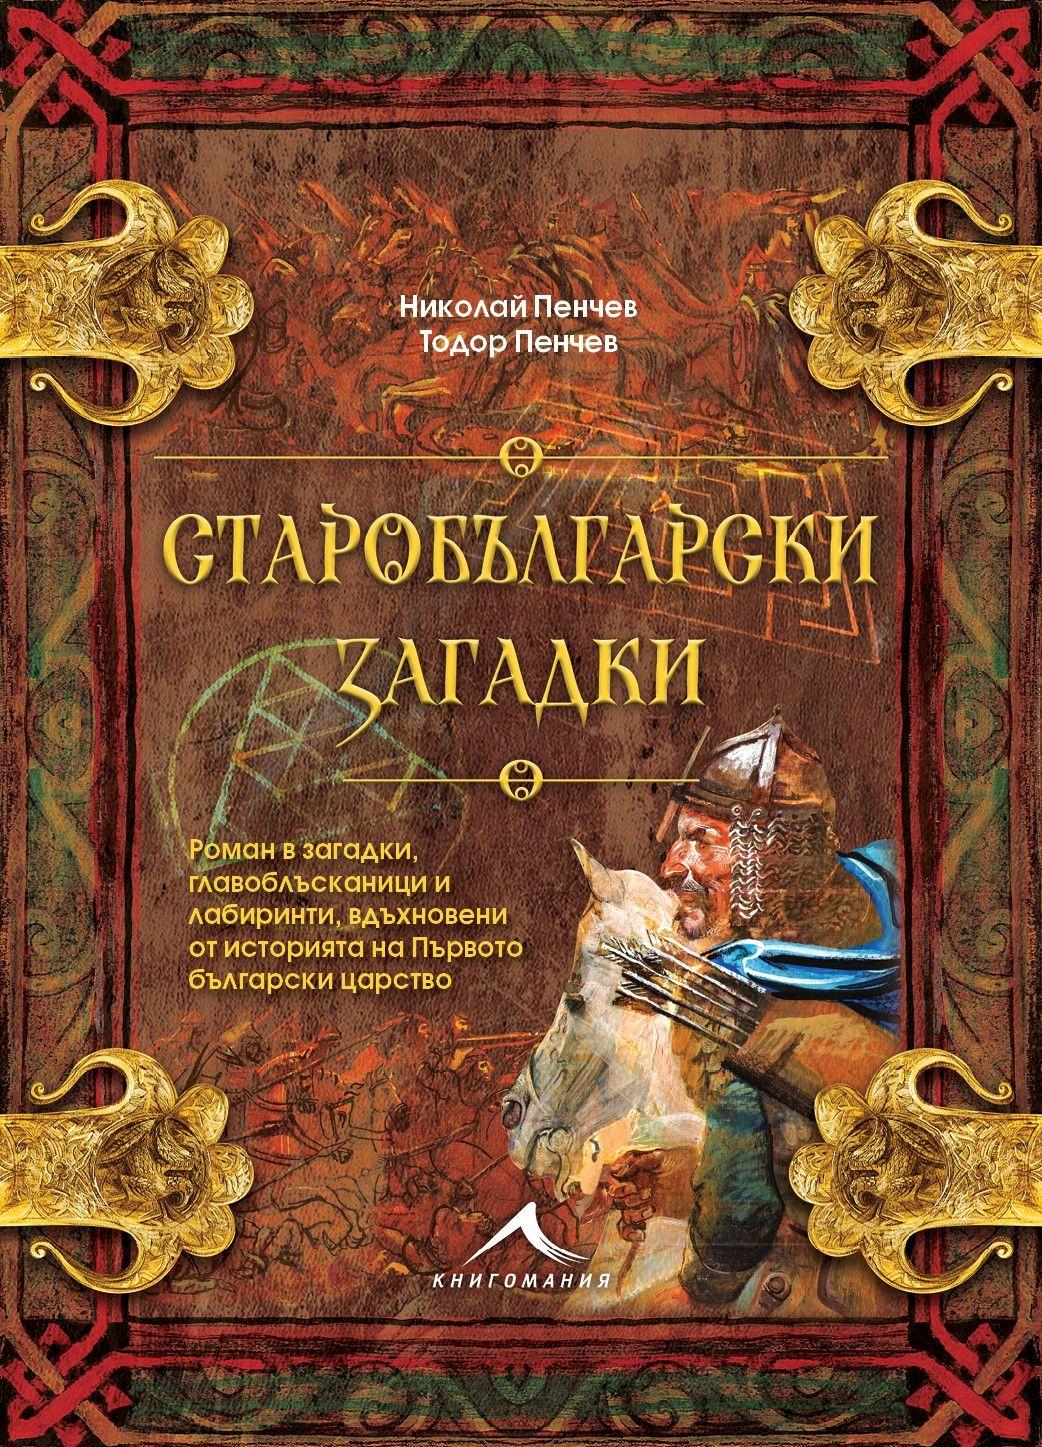 starobalgarski-zagadki-knigomantiya-tvardi-koritsi - 1